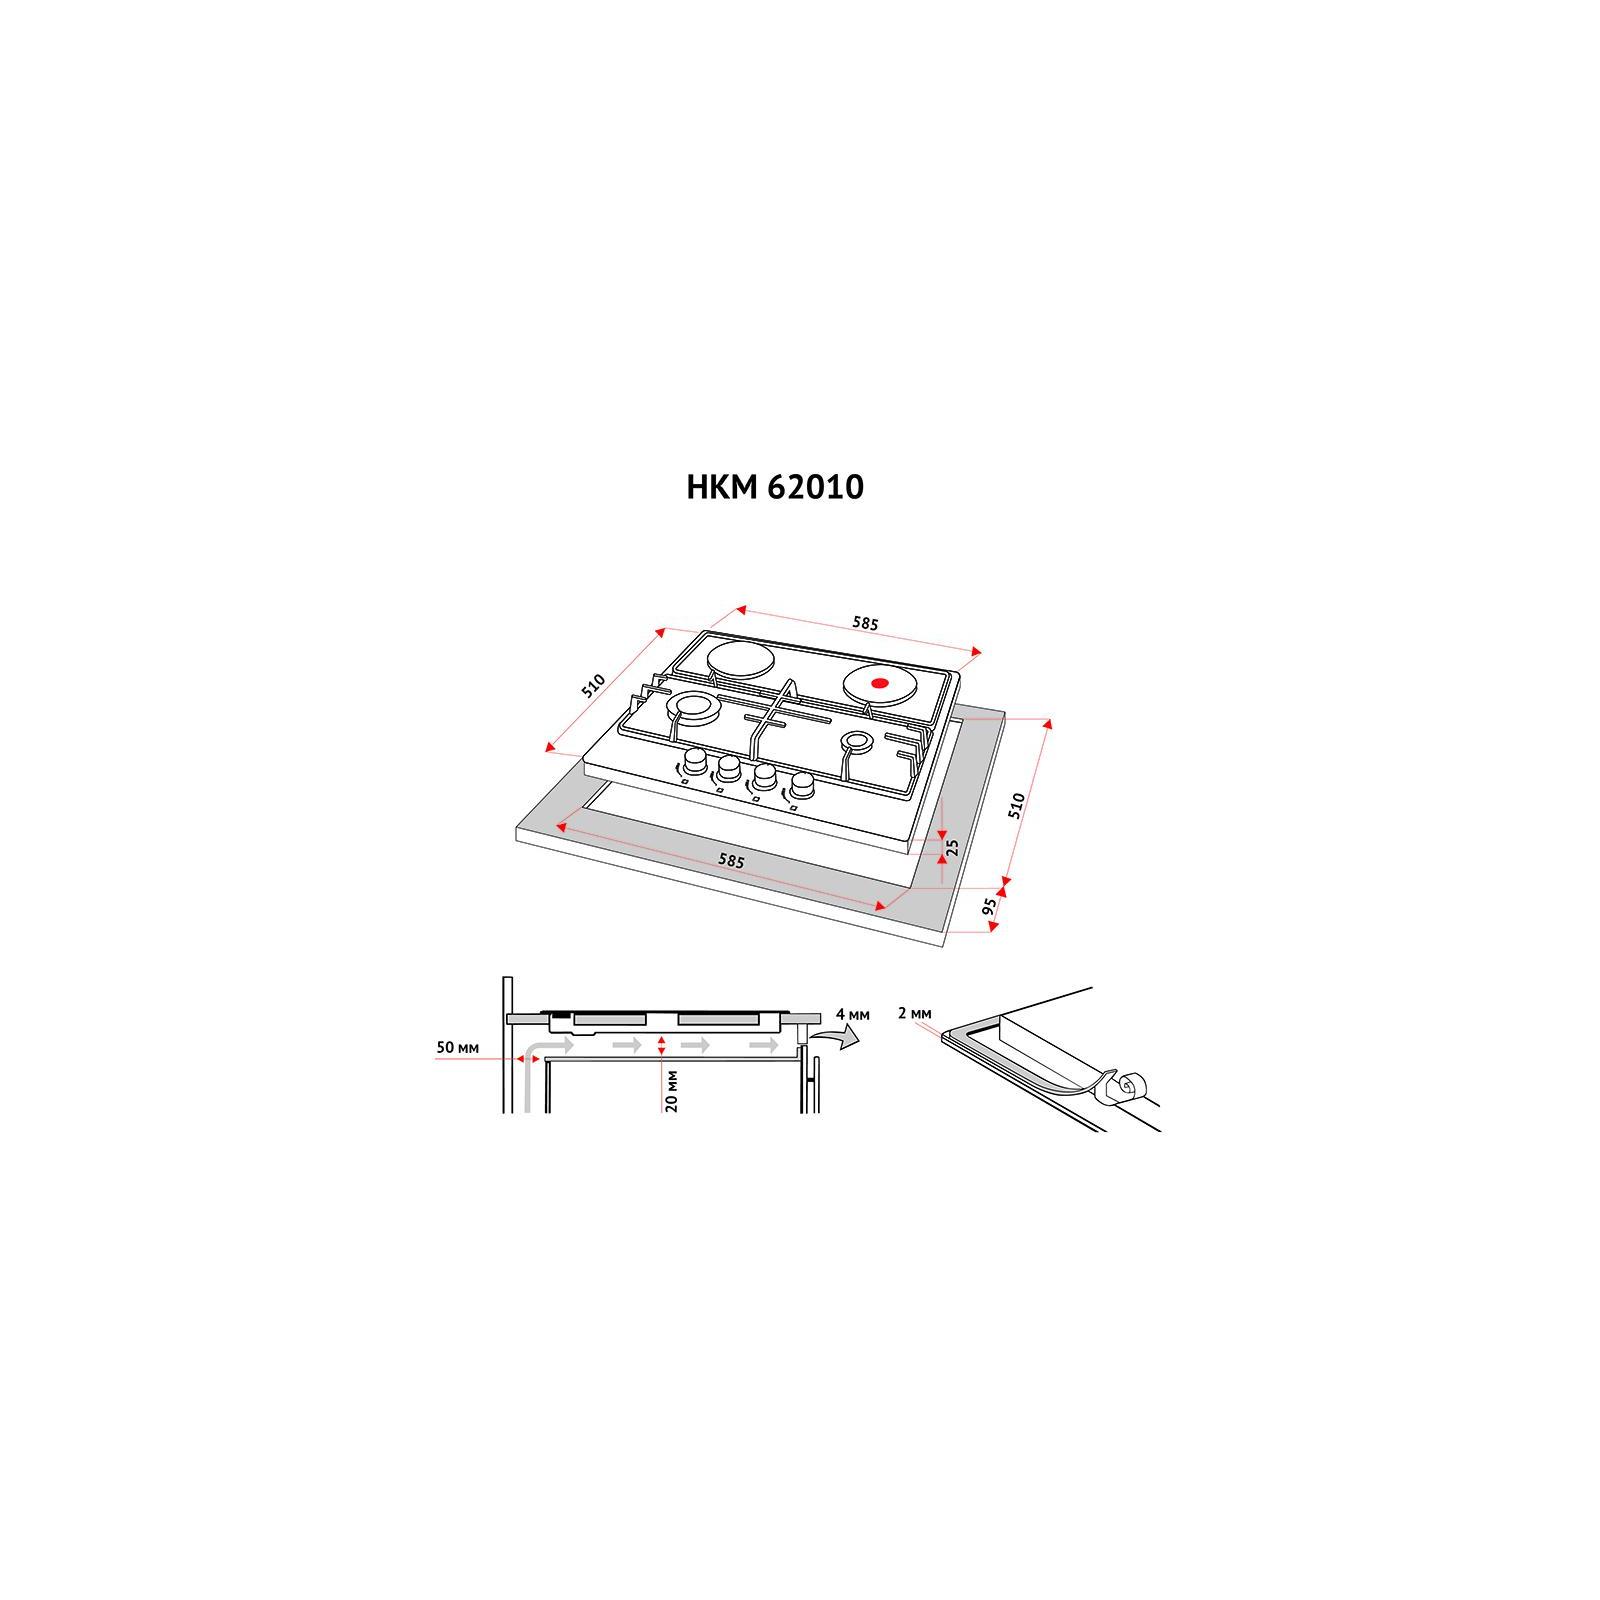 Варочная поверхность PERFELLI HKM 62010 BL изображение 7